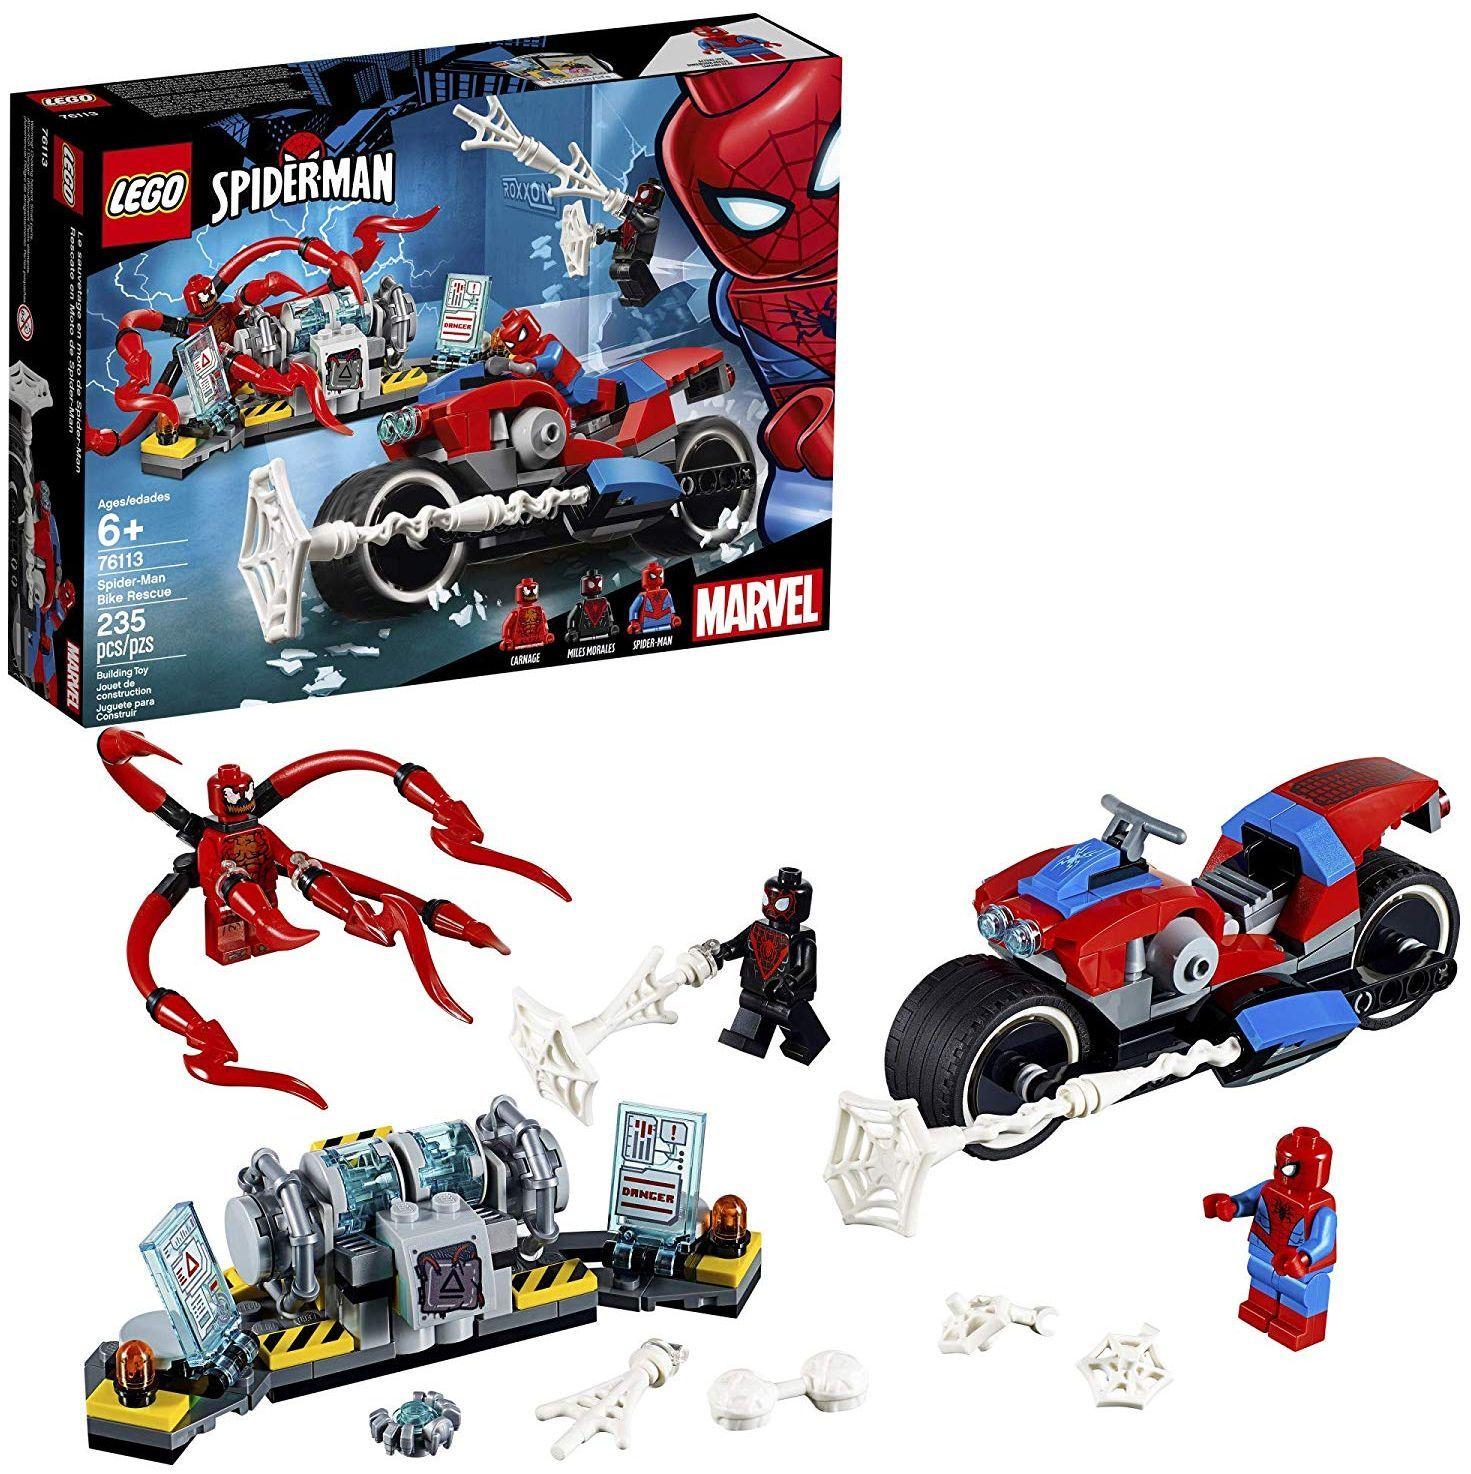 Конструктор Lego Marvel Super Heroes -Spider-Man Bike Rescue (76113) - 1